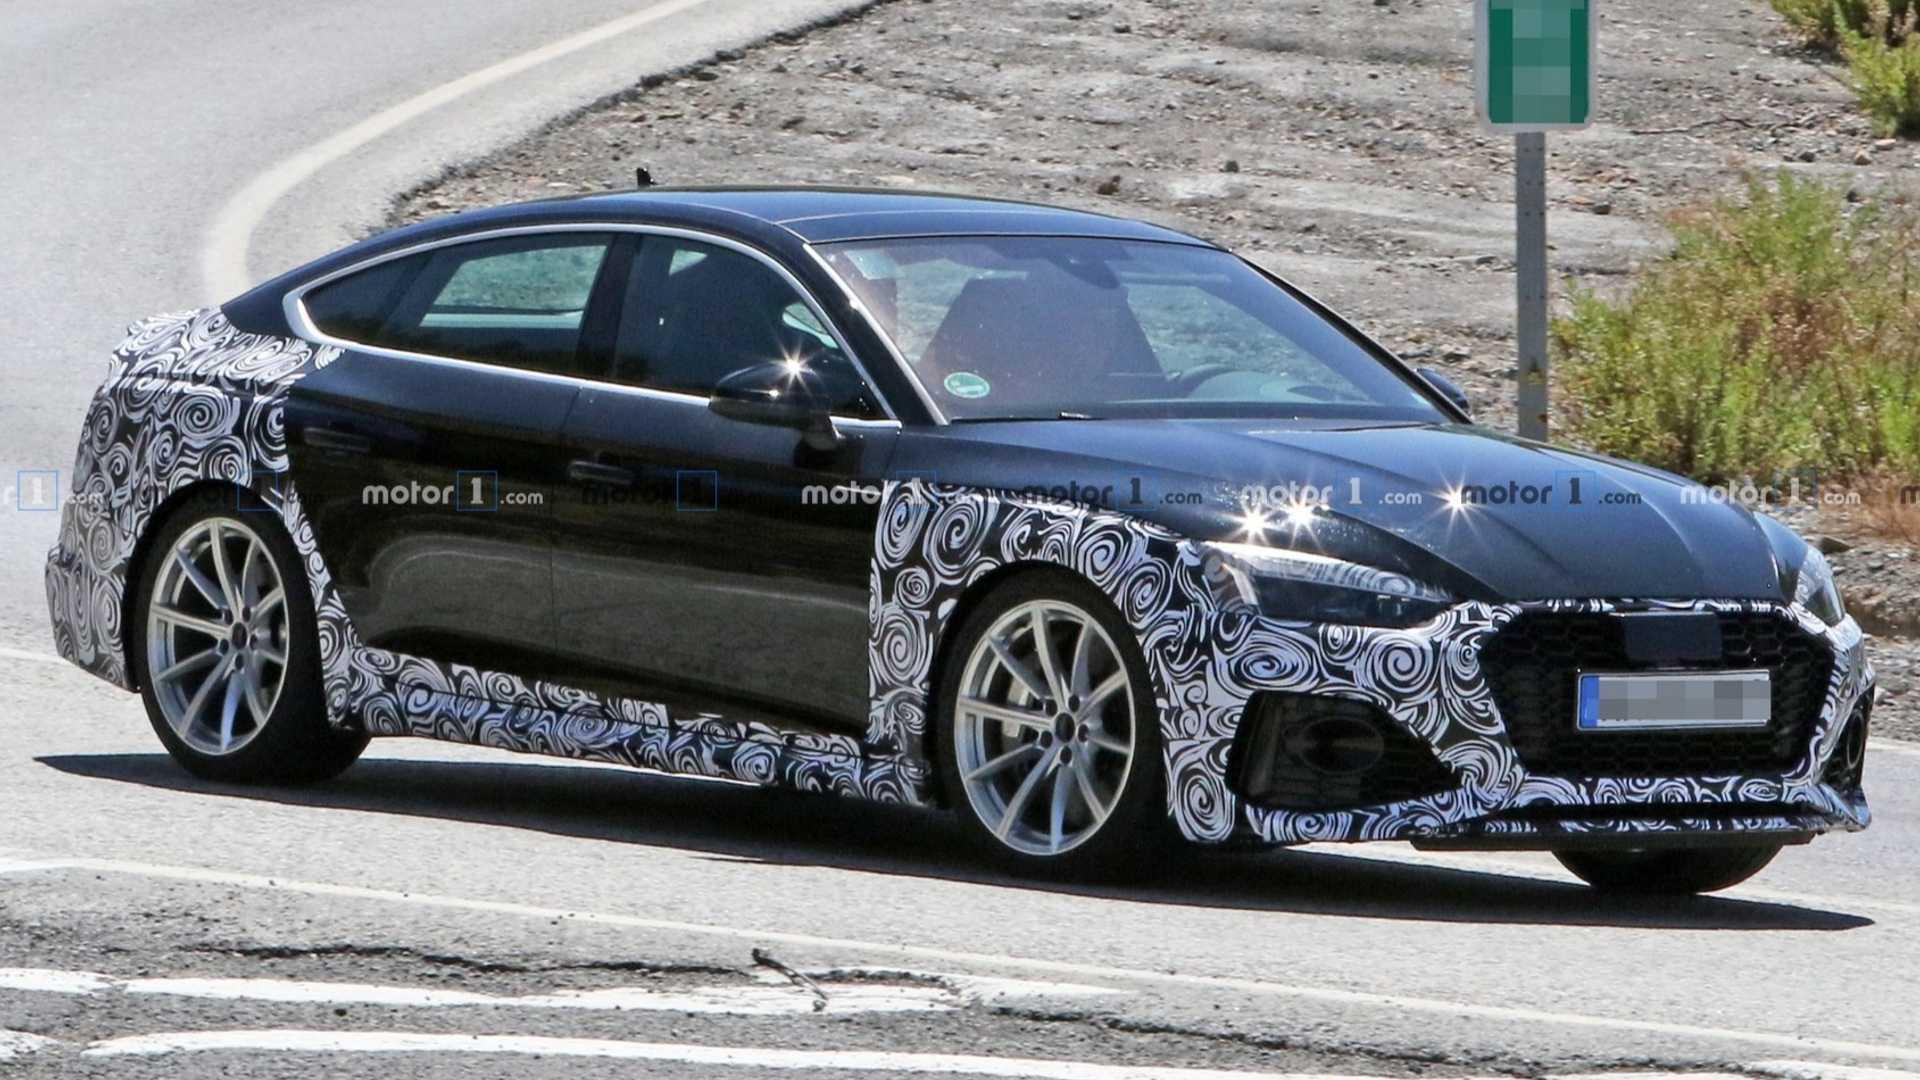 Audi Rs5 Sportback Facelift Makes Spy Photo Debut